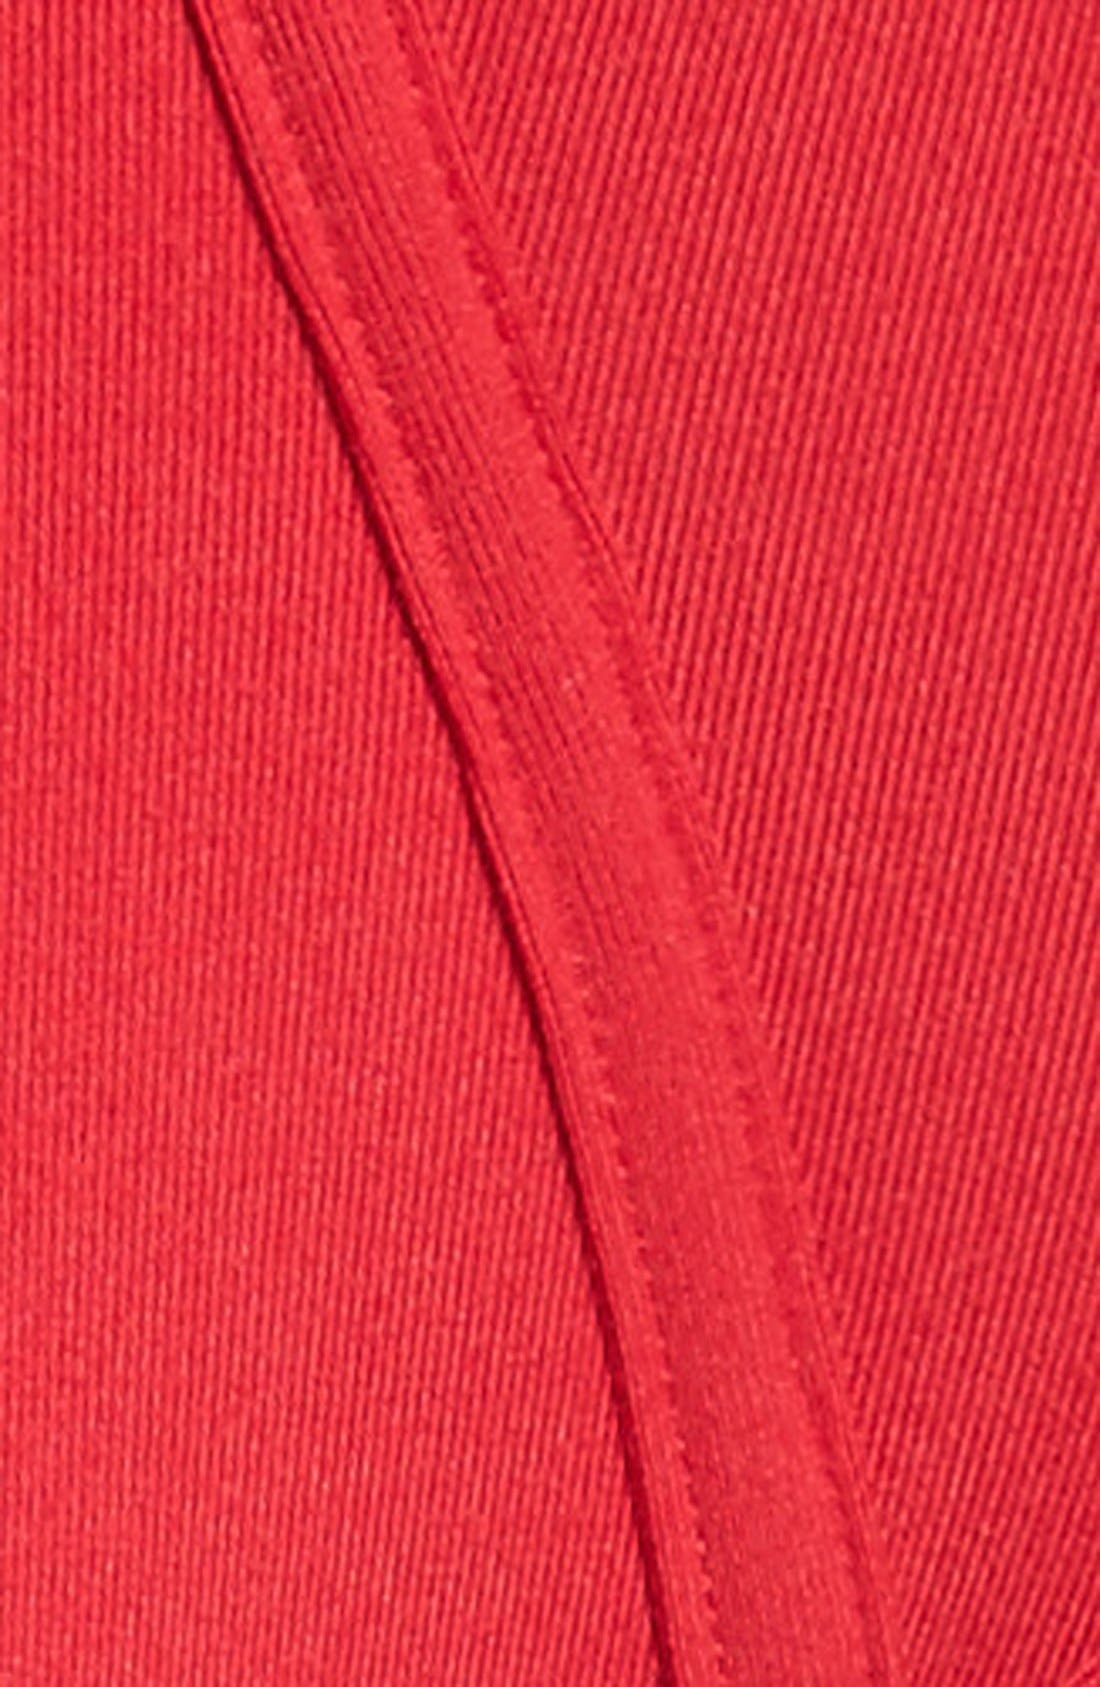 'Steel - U2715' Microfiber Hip Briefs,                             Alternate thumbnail 135, color,